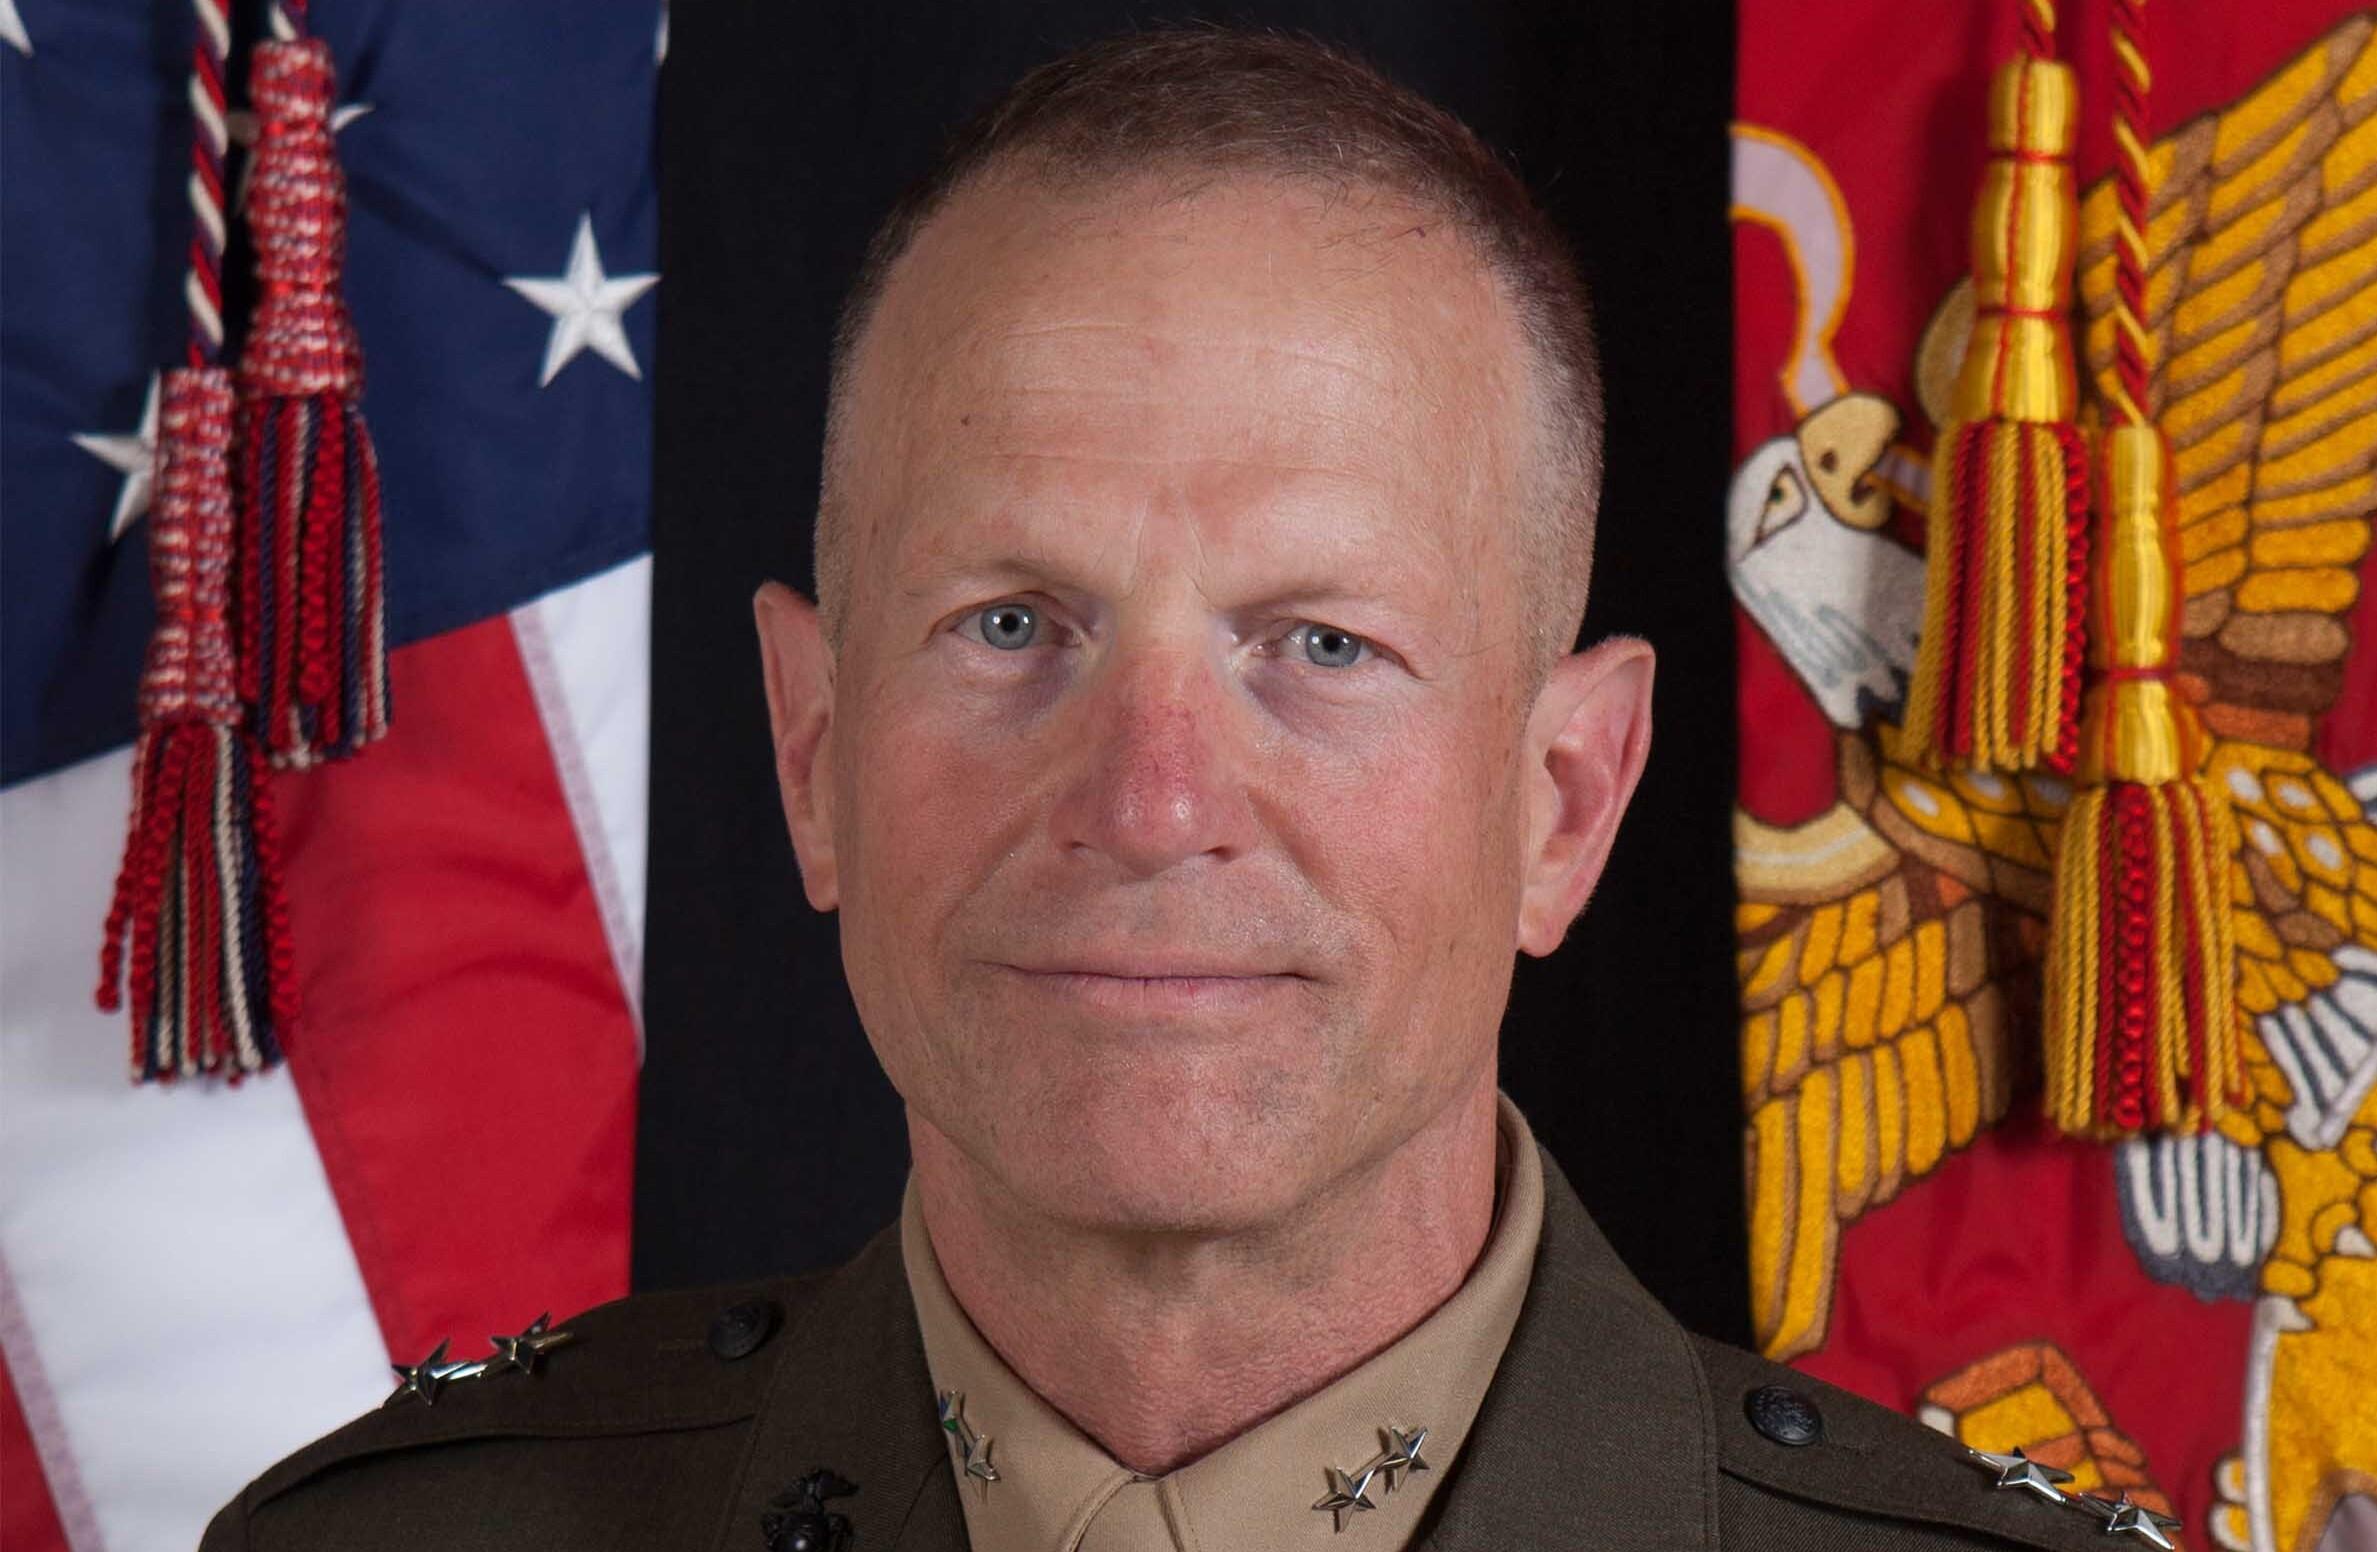 jim mattis taps fellow marine general to speak for the pentagon